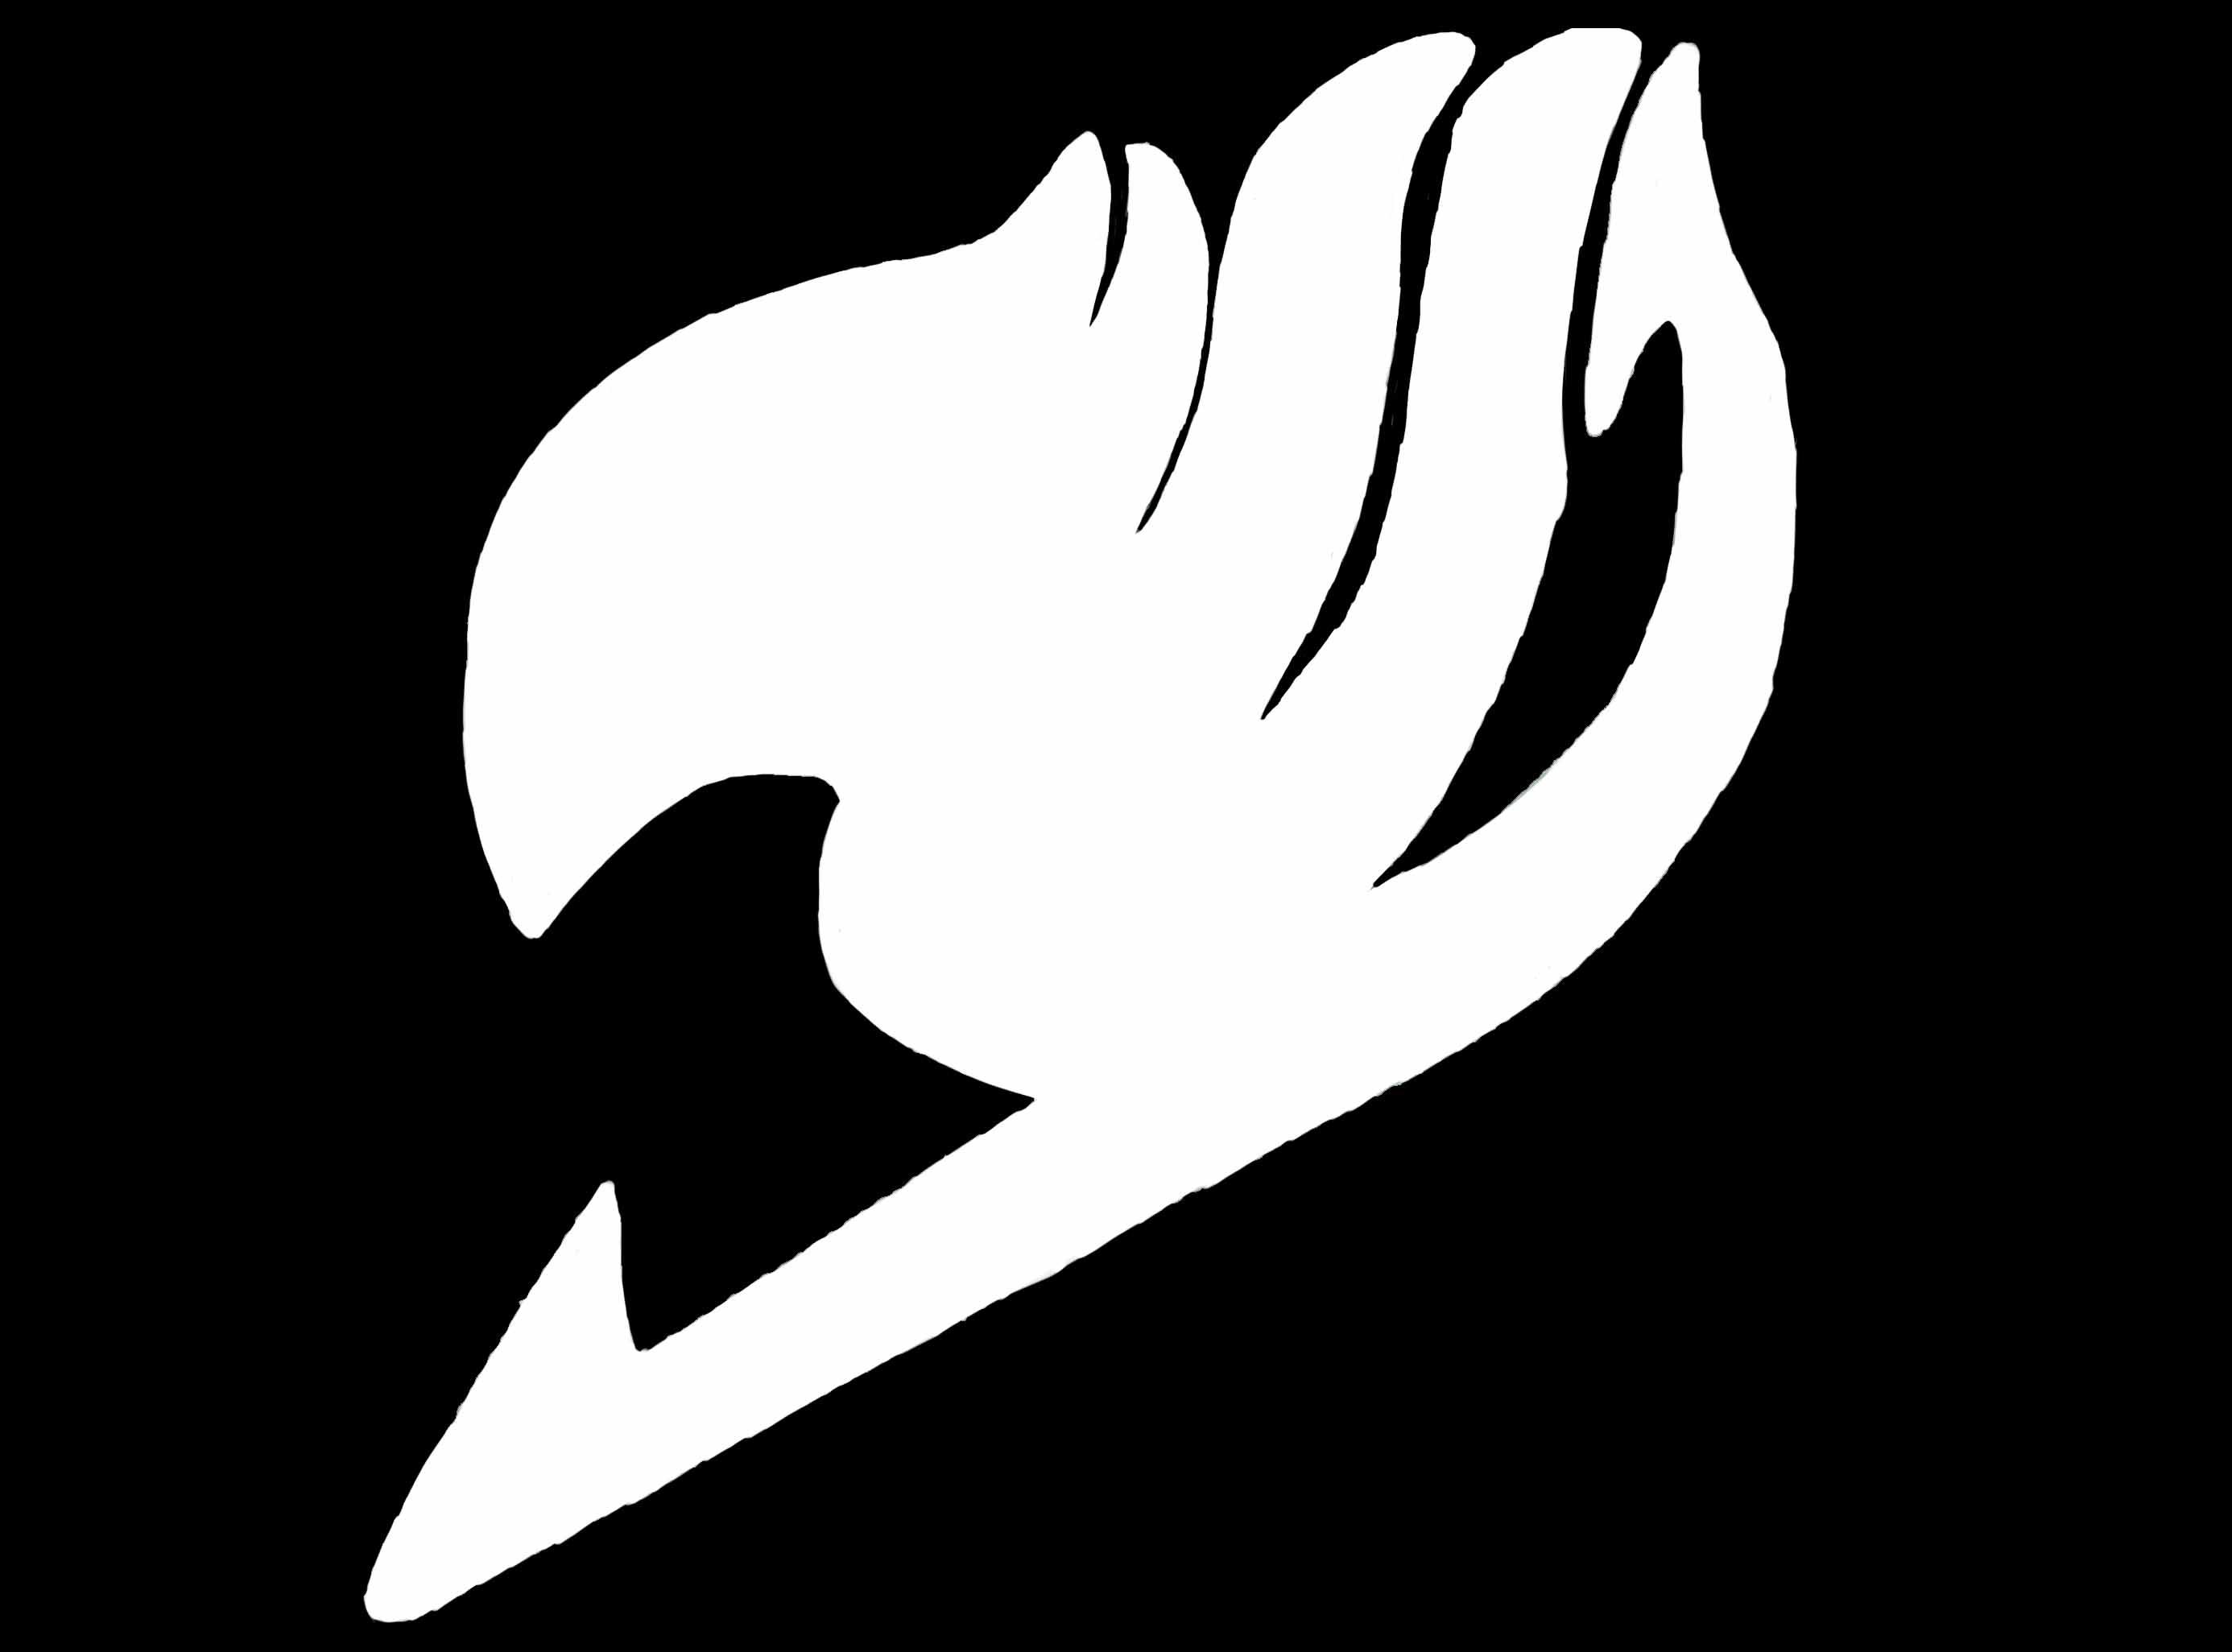 fairy tail logo wallpaper | pixelstalk